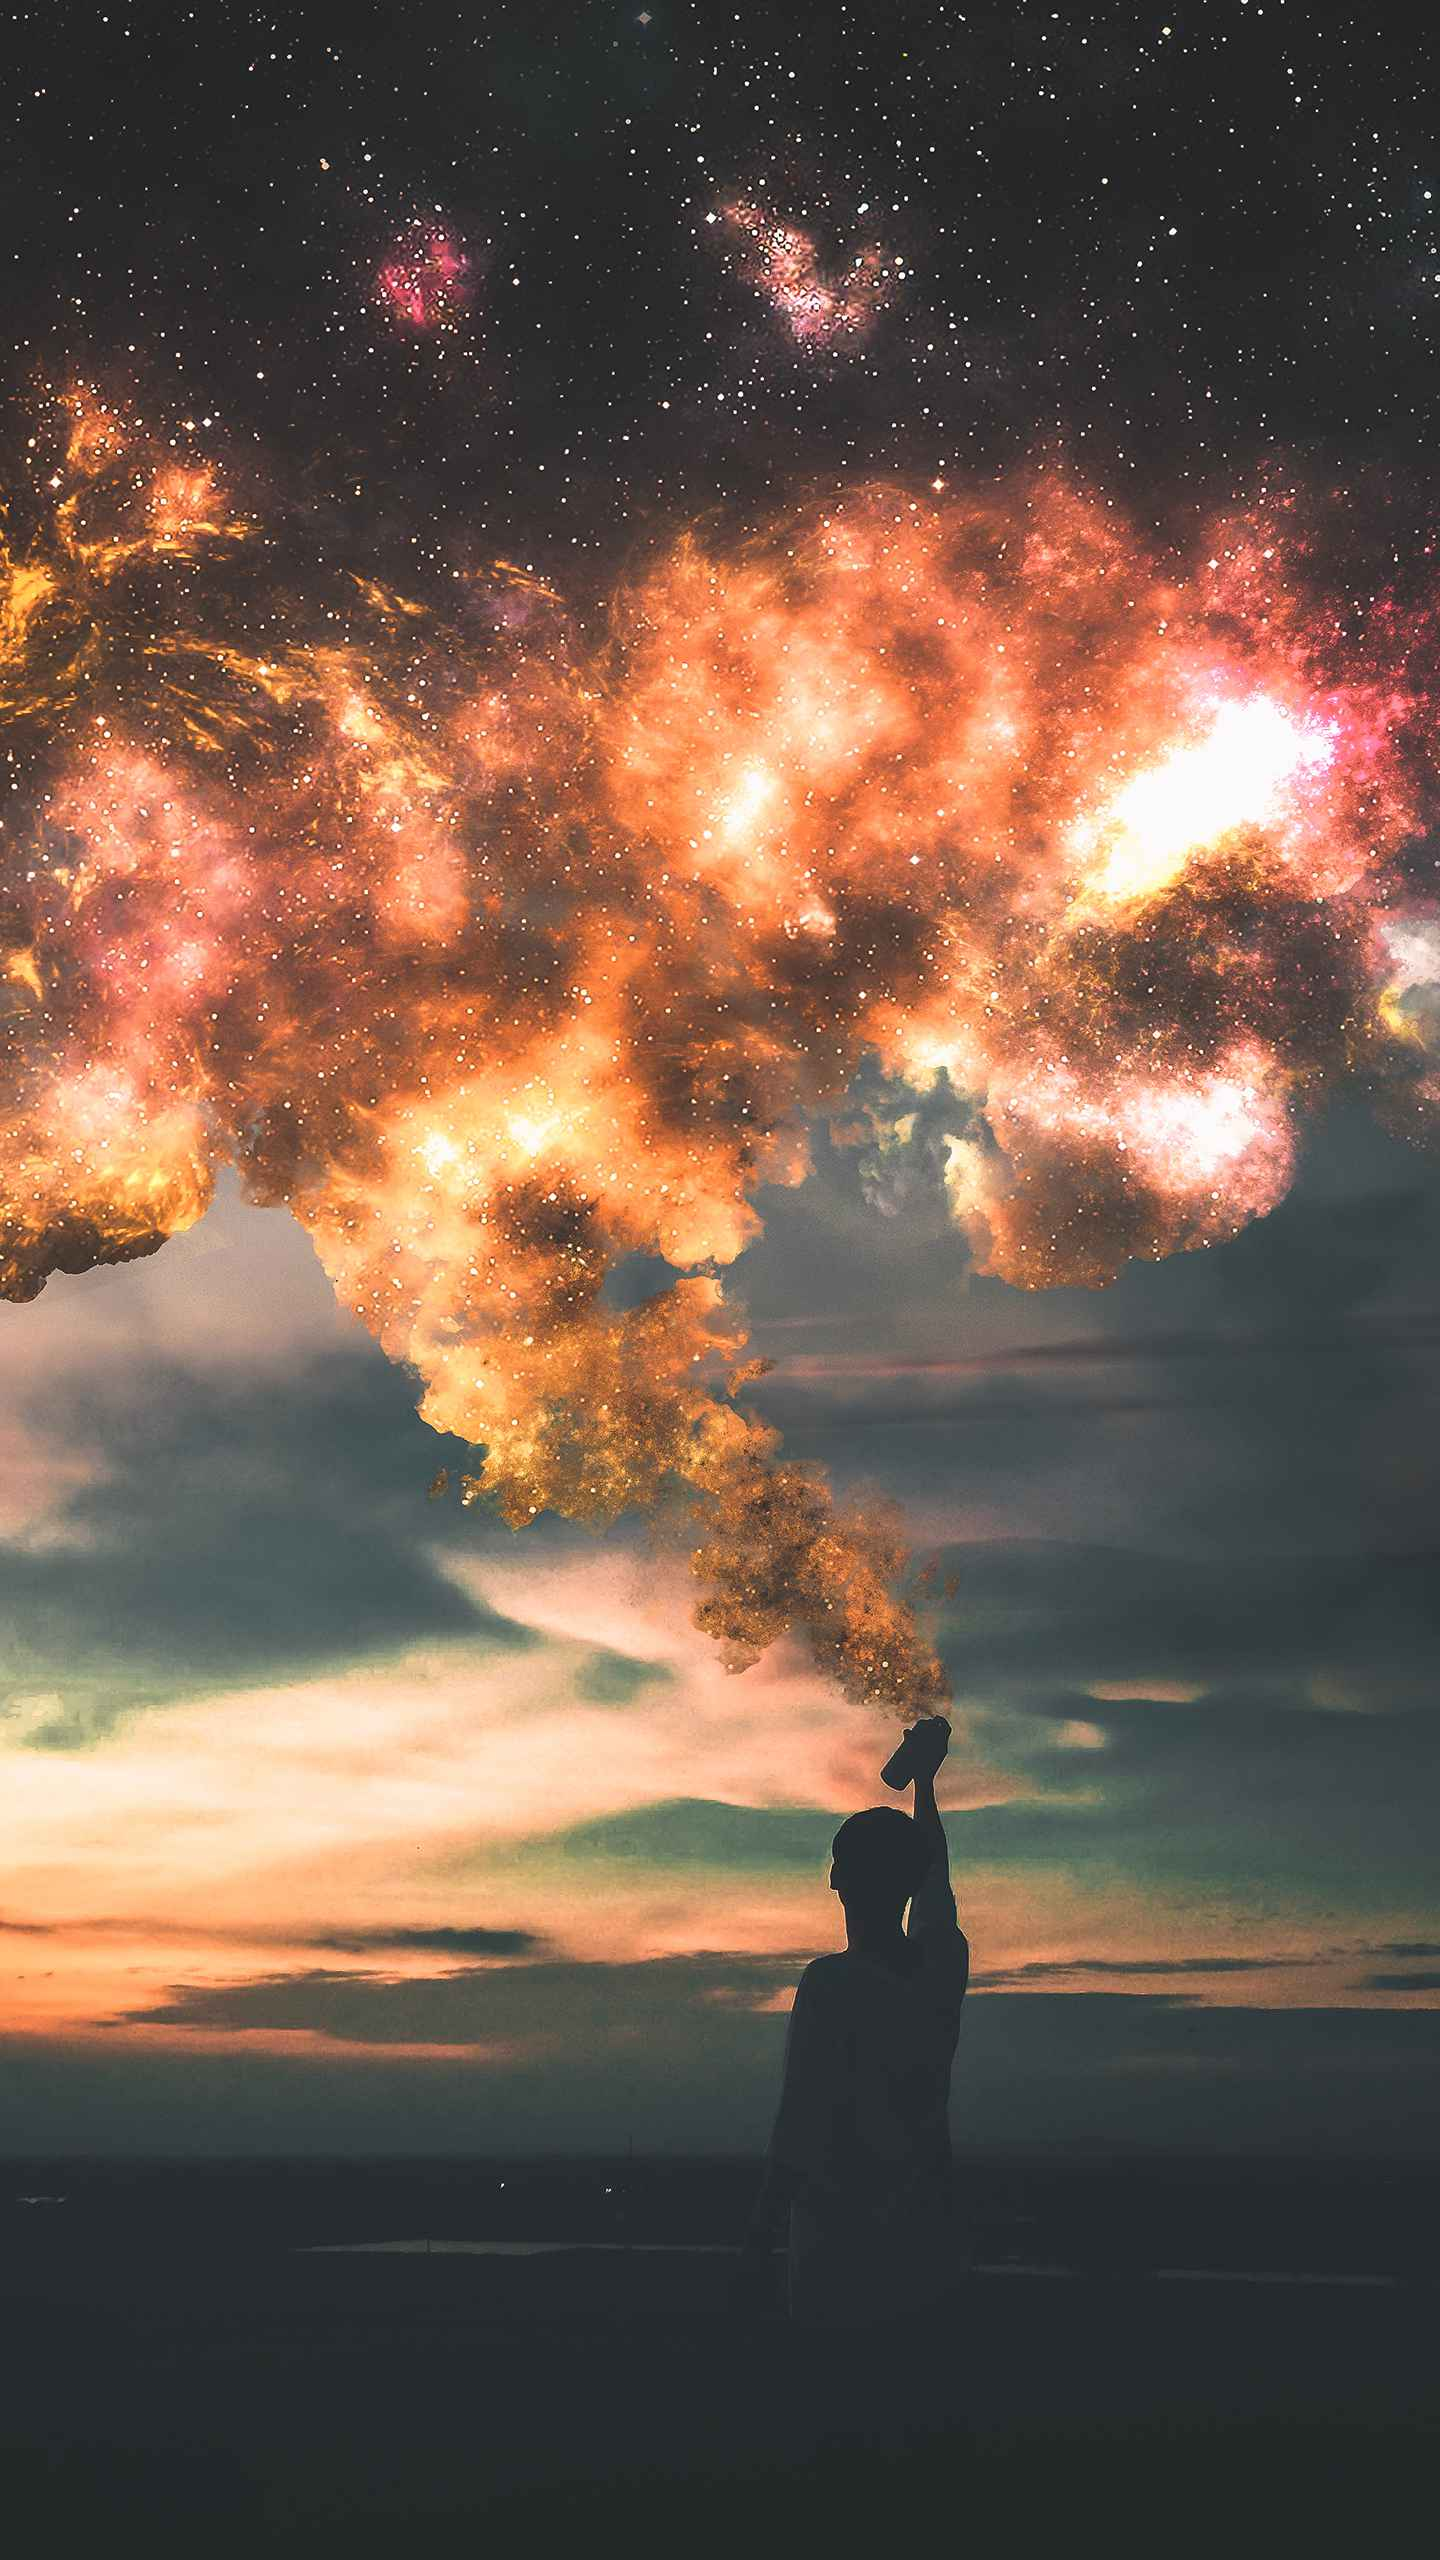 Supercluster Art iPhone Wallpaper